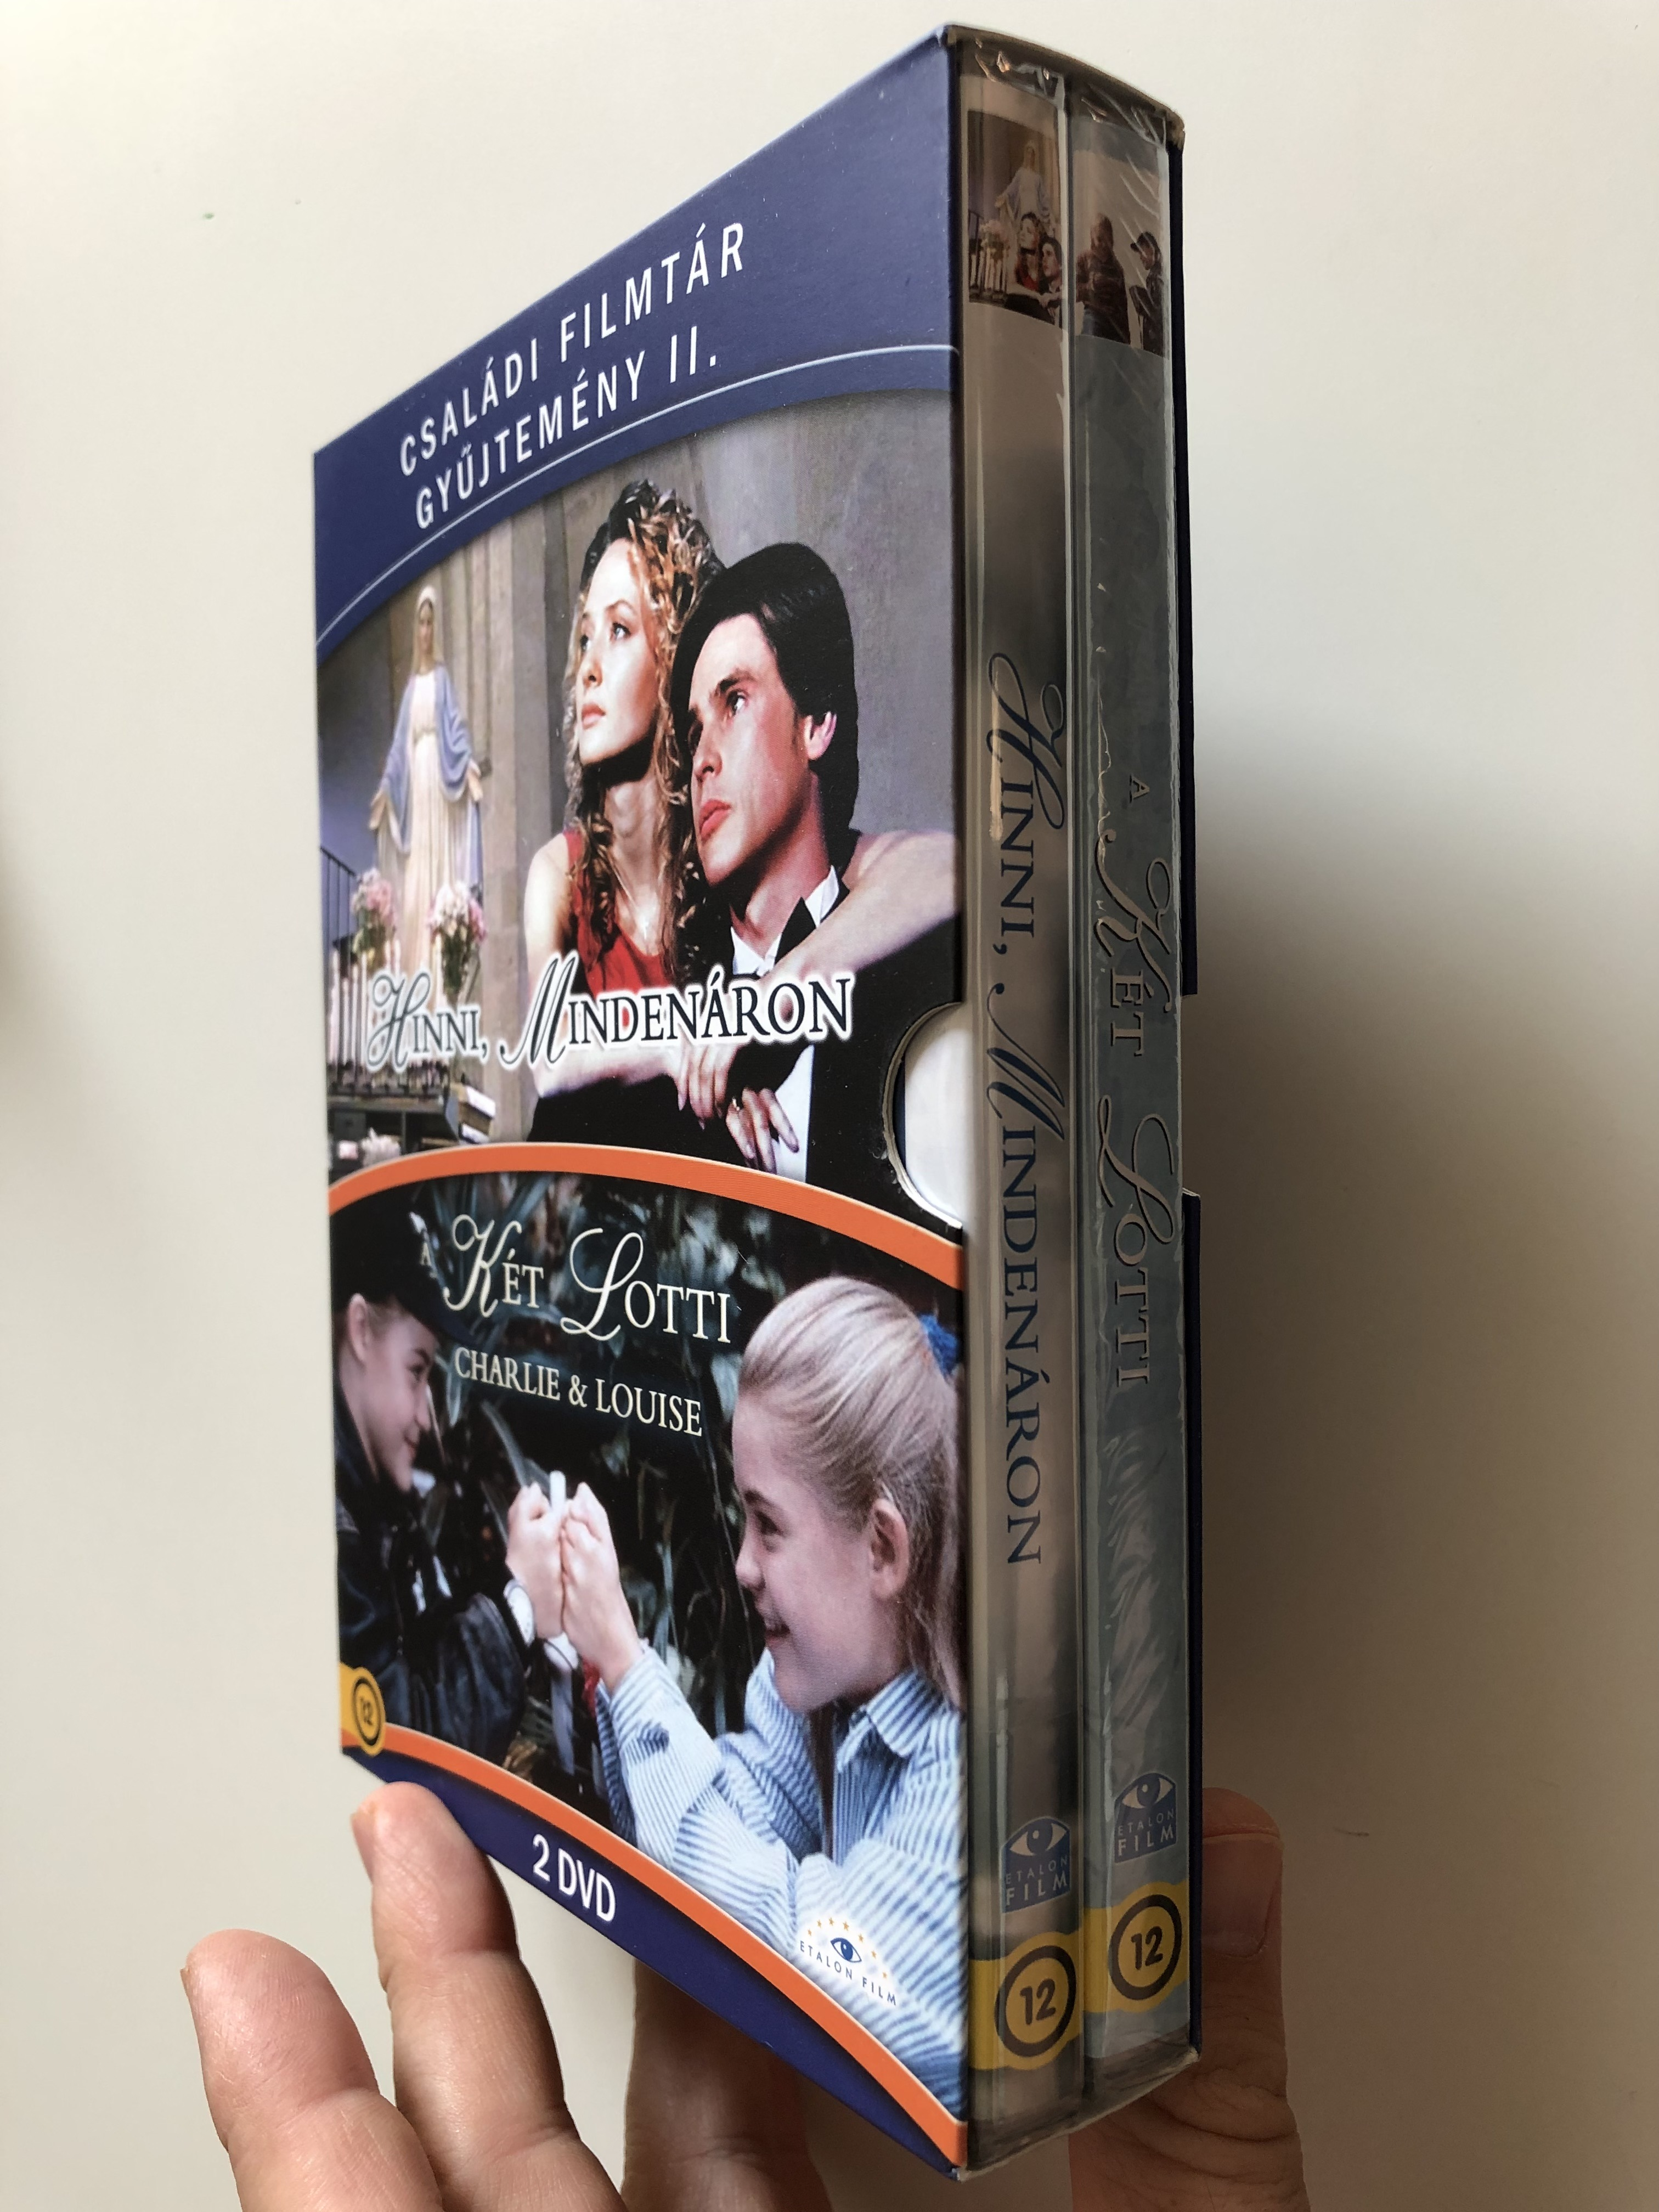 family-film-collection-ii-something-to-believe-in-1998-charlie-louise-1994-2-dvd-sleeve-l-lekemel-csal-di-filmek-csal-di-filmt-r-gy-jtem-ny-ii-3-.jpg